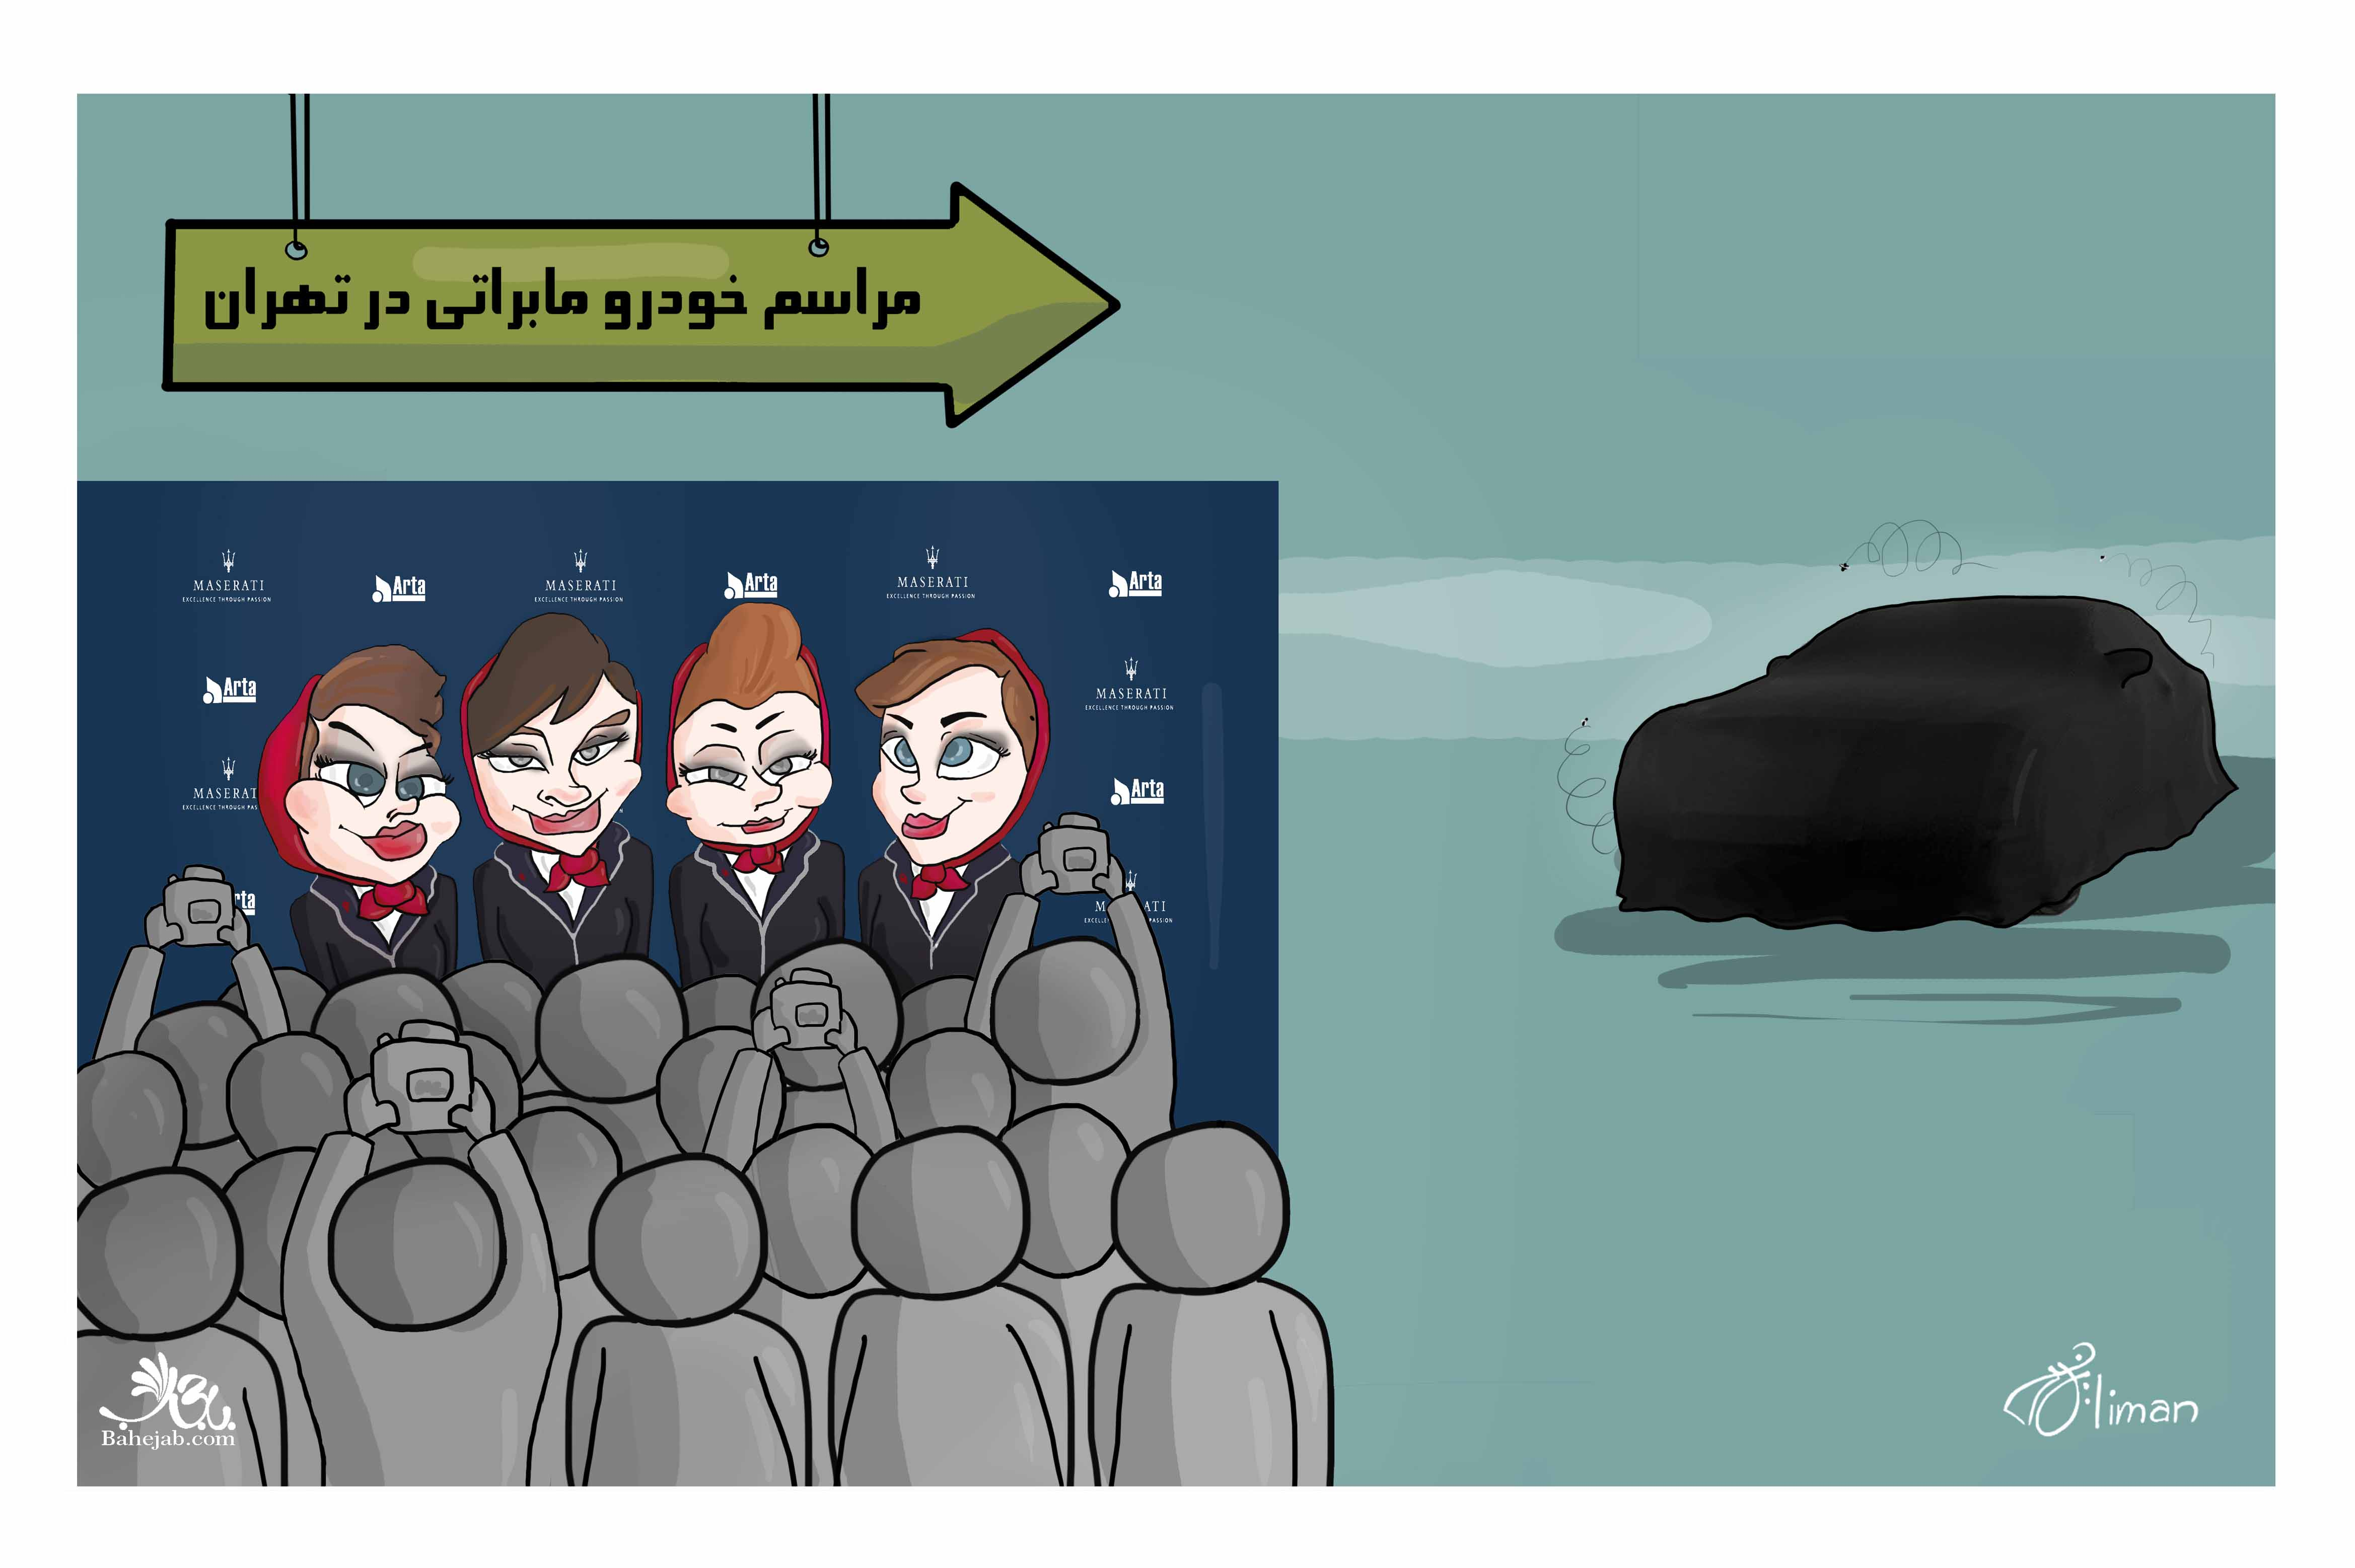 مازراتی(11)-(www.nooriazbehesht.ir).jpg (4677×3115)